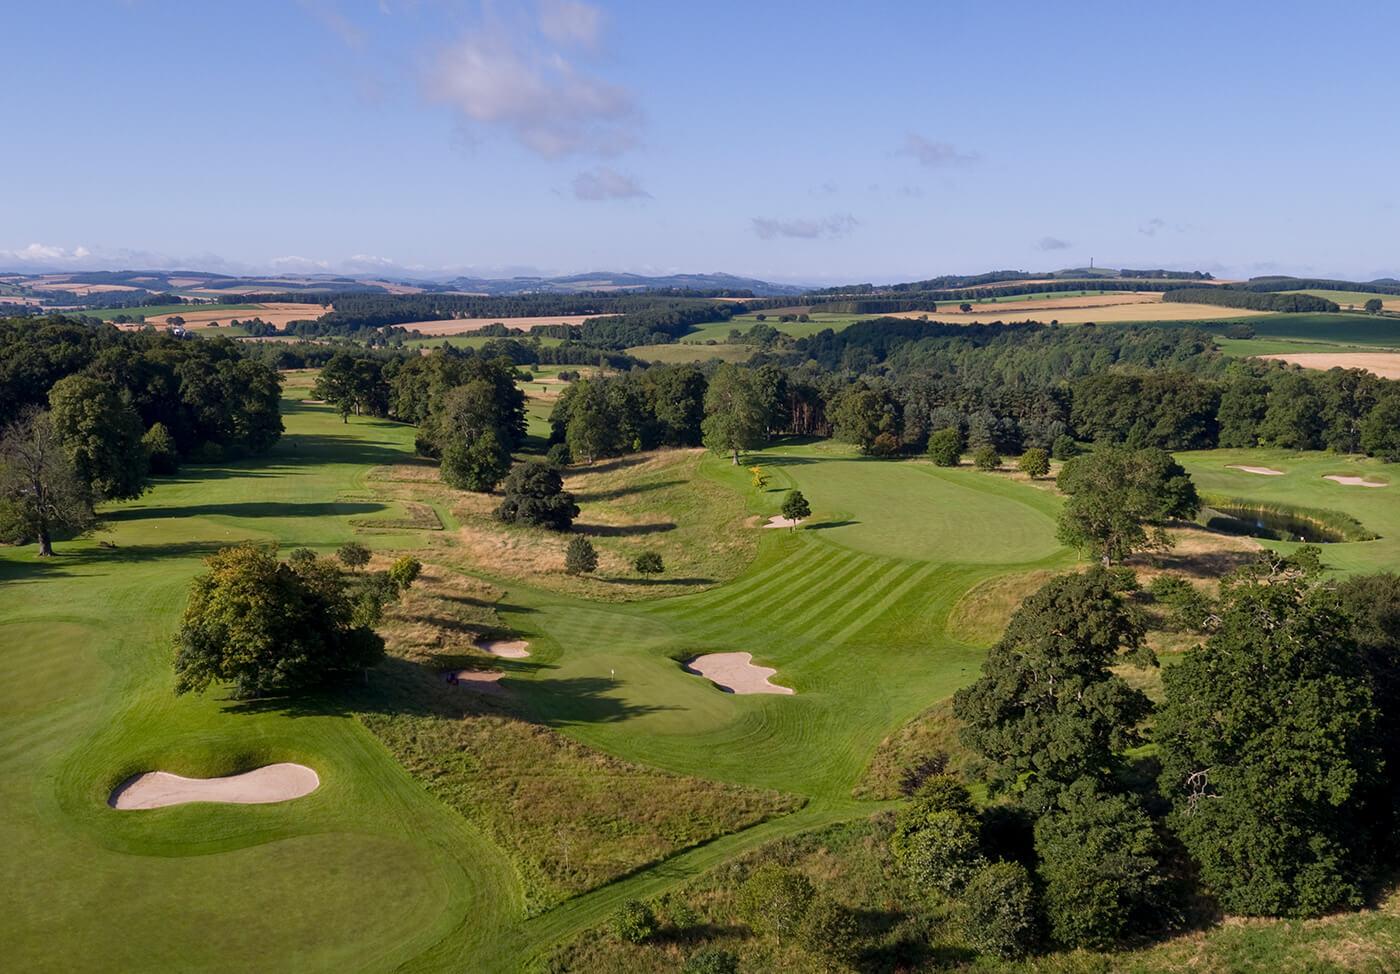 The Roxburghe Hotel & Golf Course Golf Course